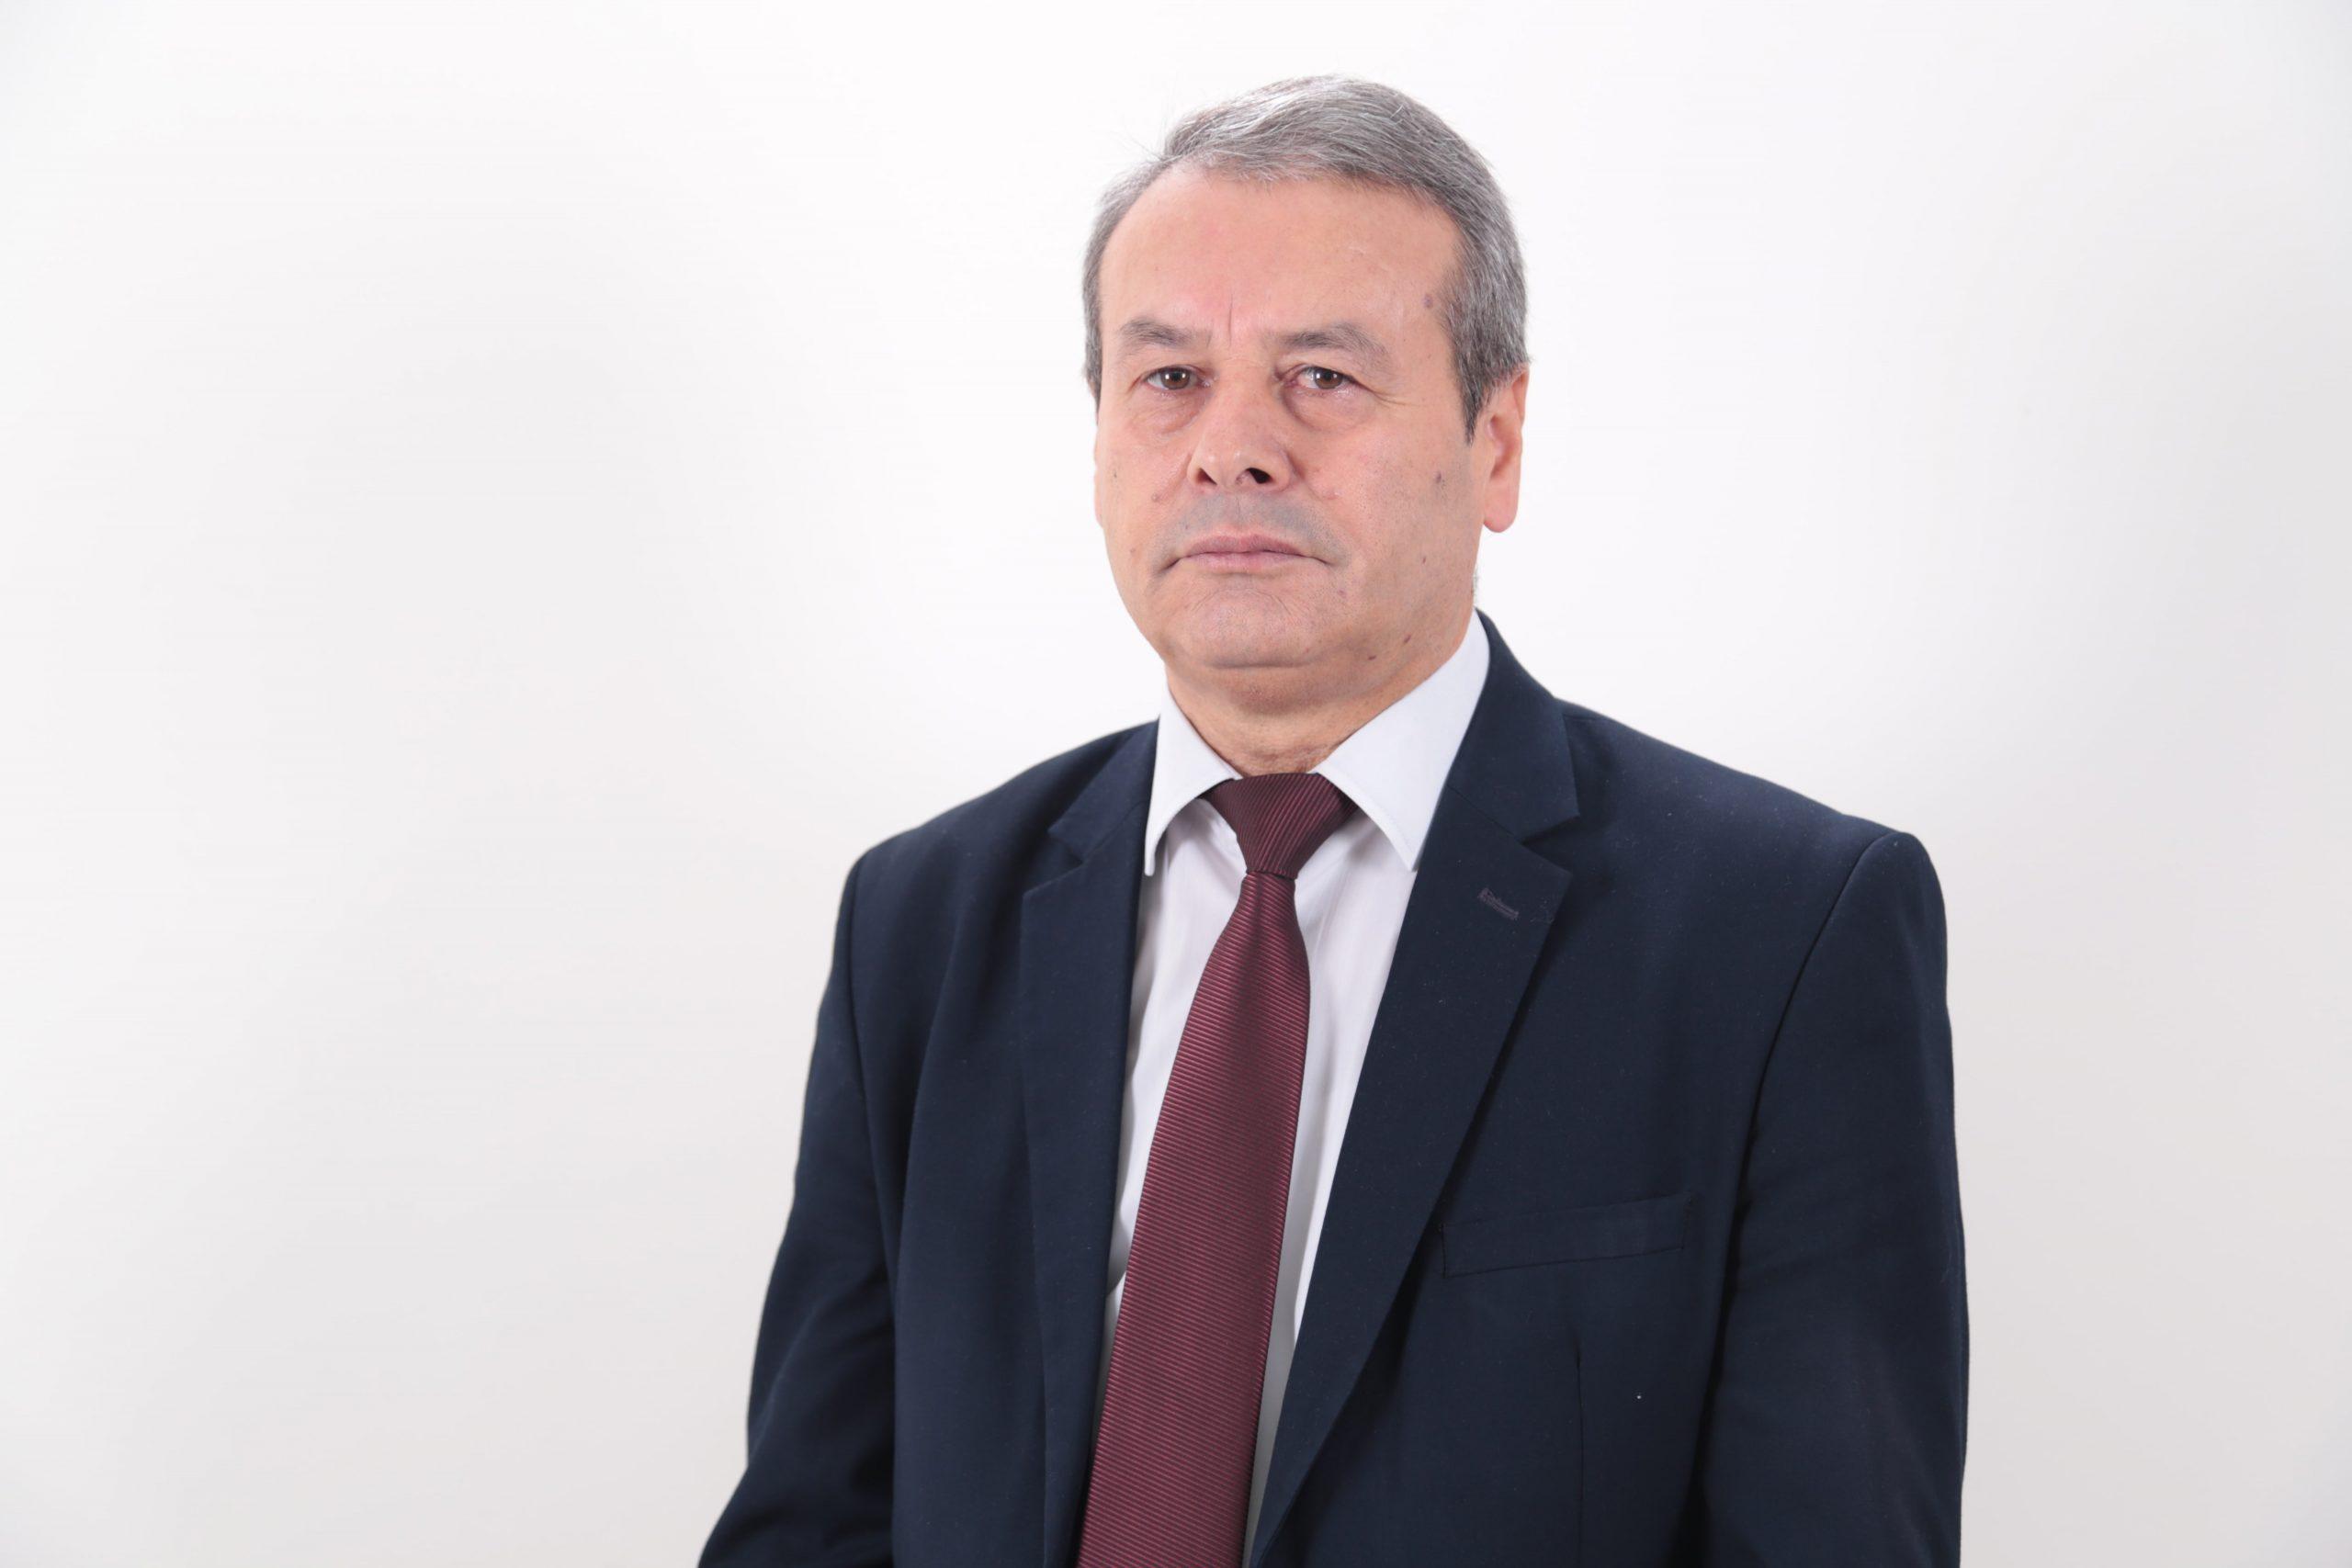 Enver Krasniqi